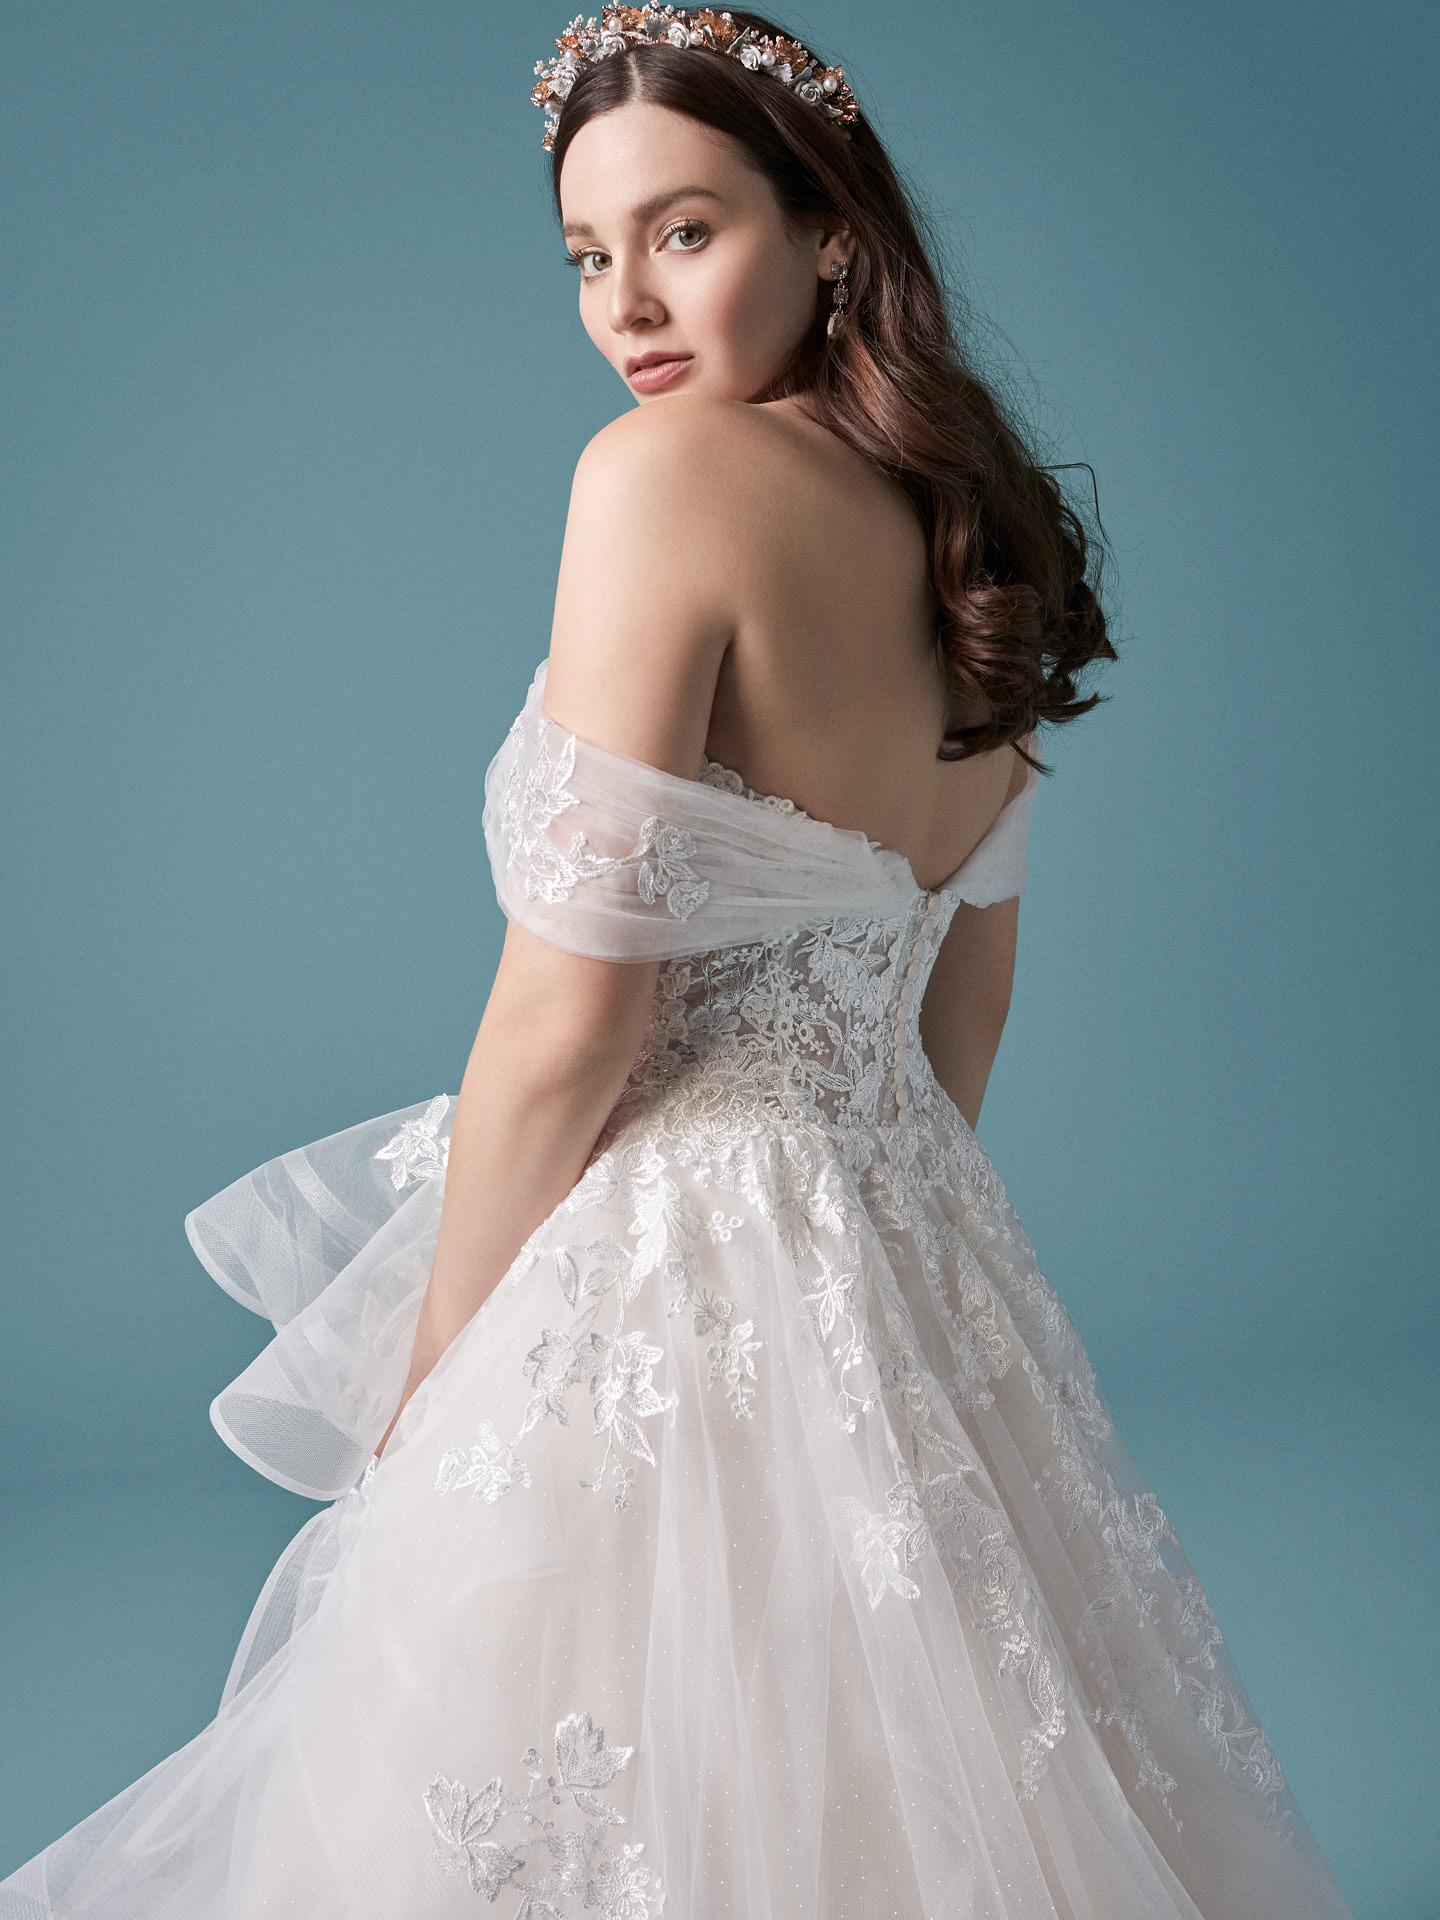 35 modelos de vestido de noiva romântico para se apaixonar